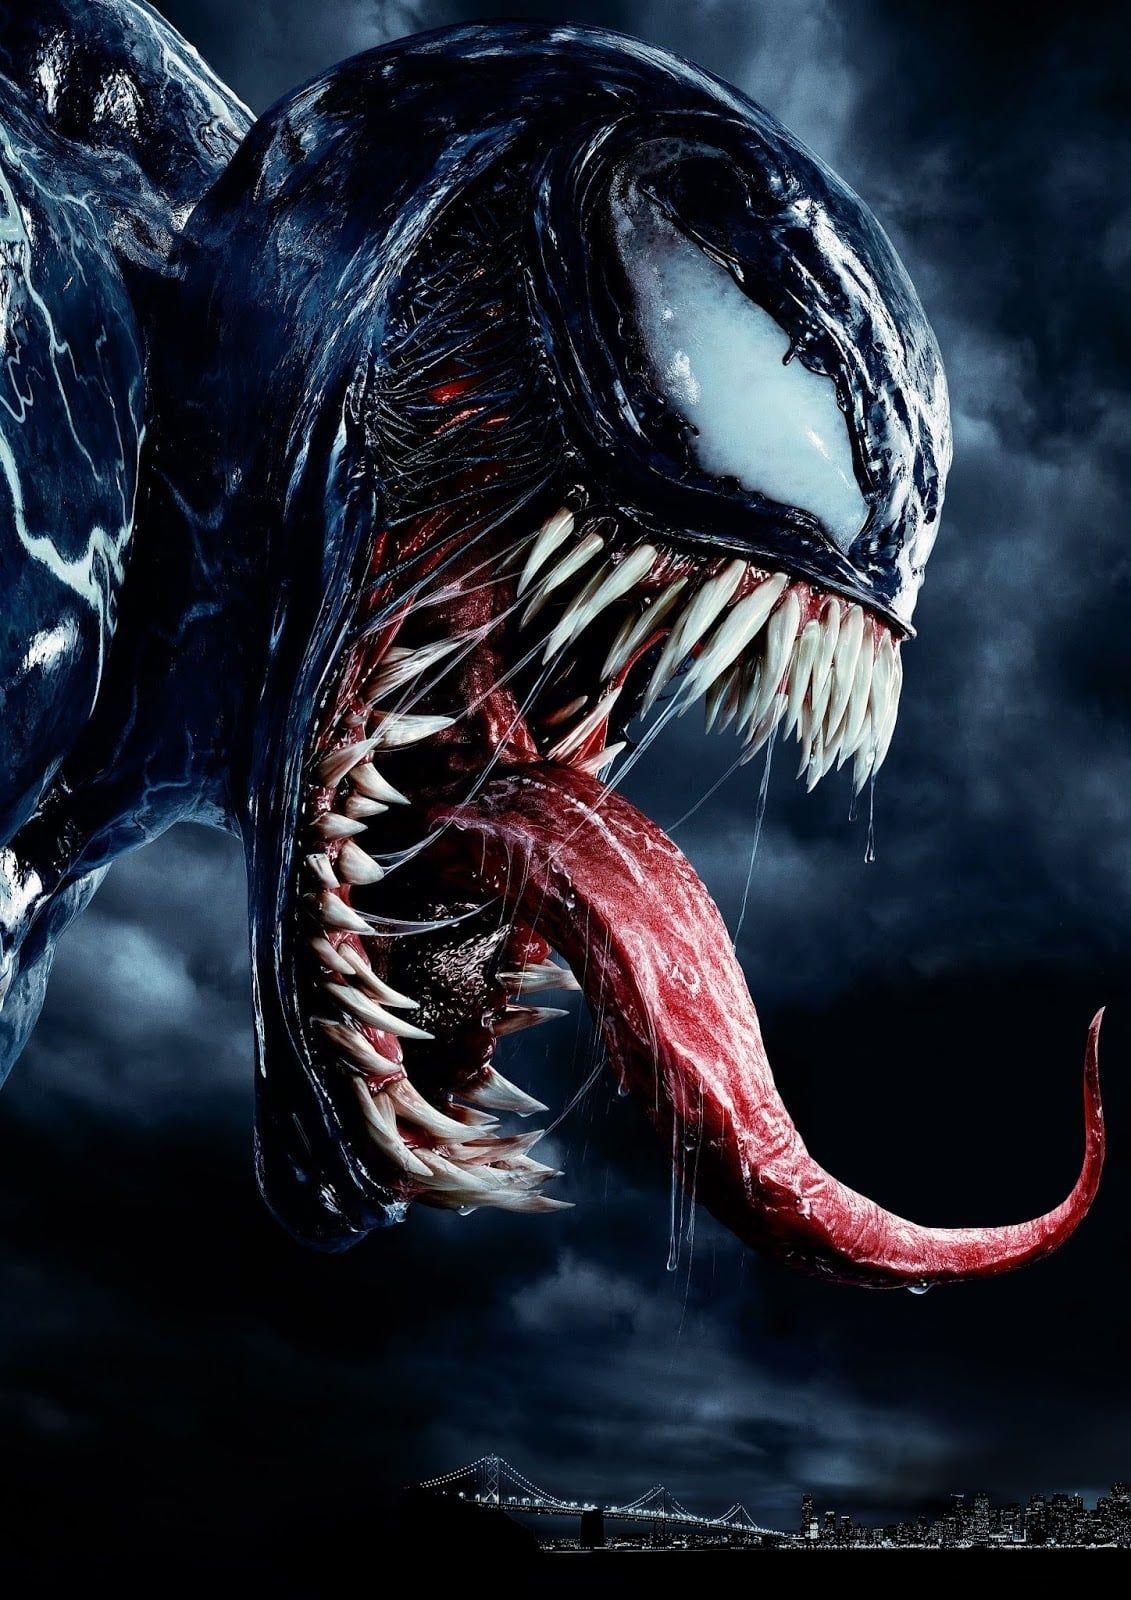 Venom Pelicula Pleta Espanol Latino Repelis Venom Pelicula Pleta Espanol Latino Descargar Venom Movie Venom Comics Venom